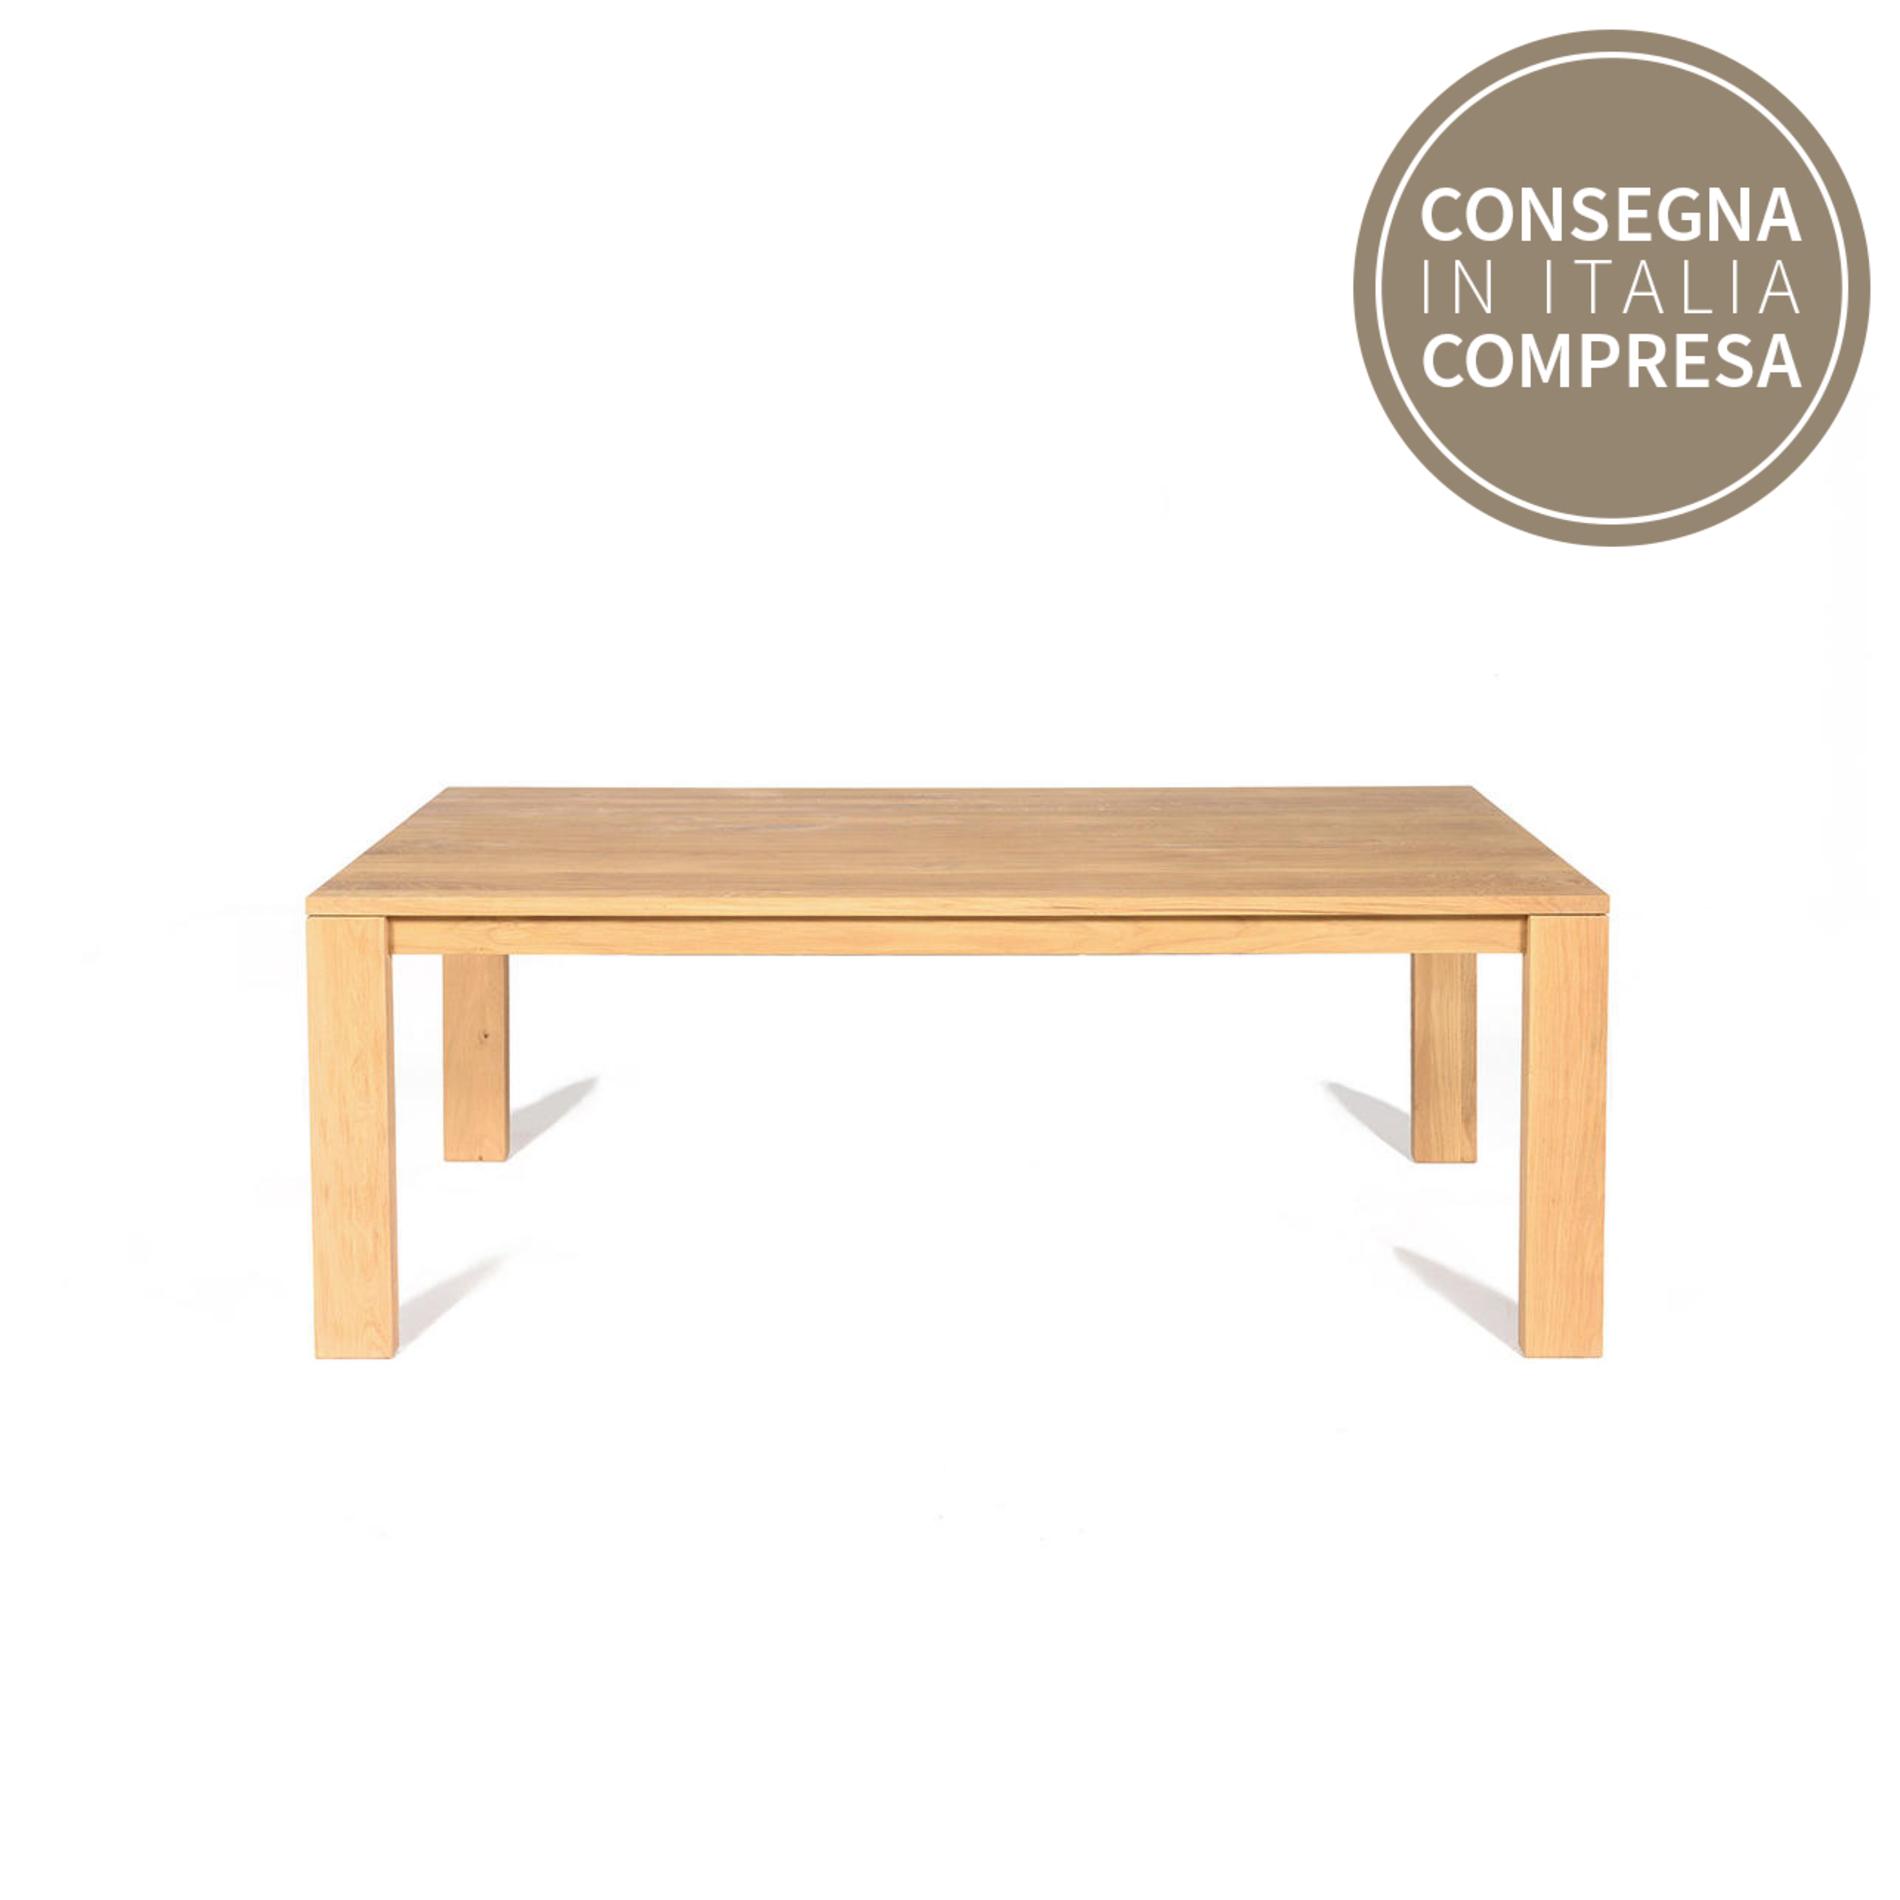 Cargo oak emotion dining table coincasa for Coin tavoli